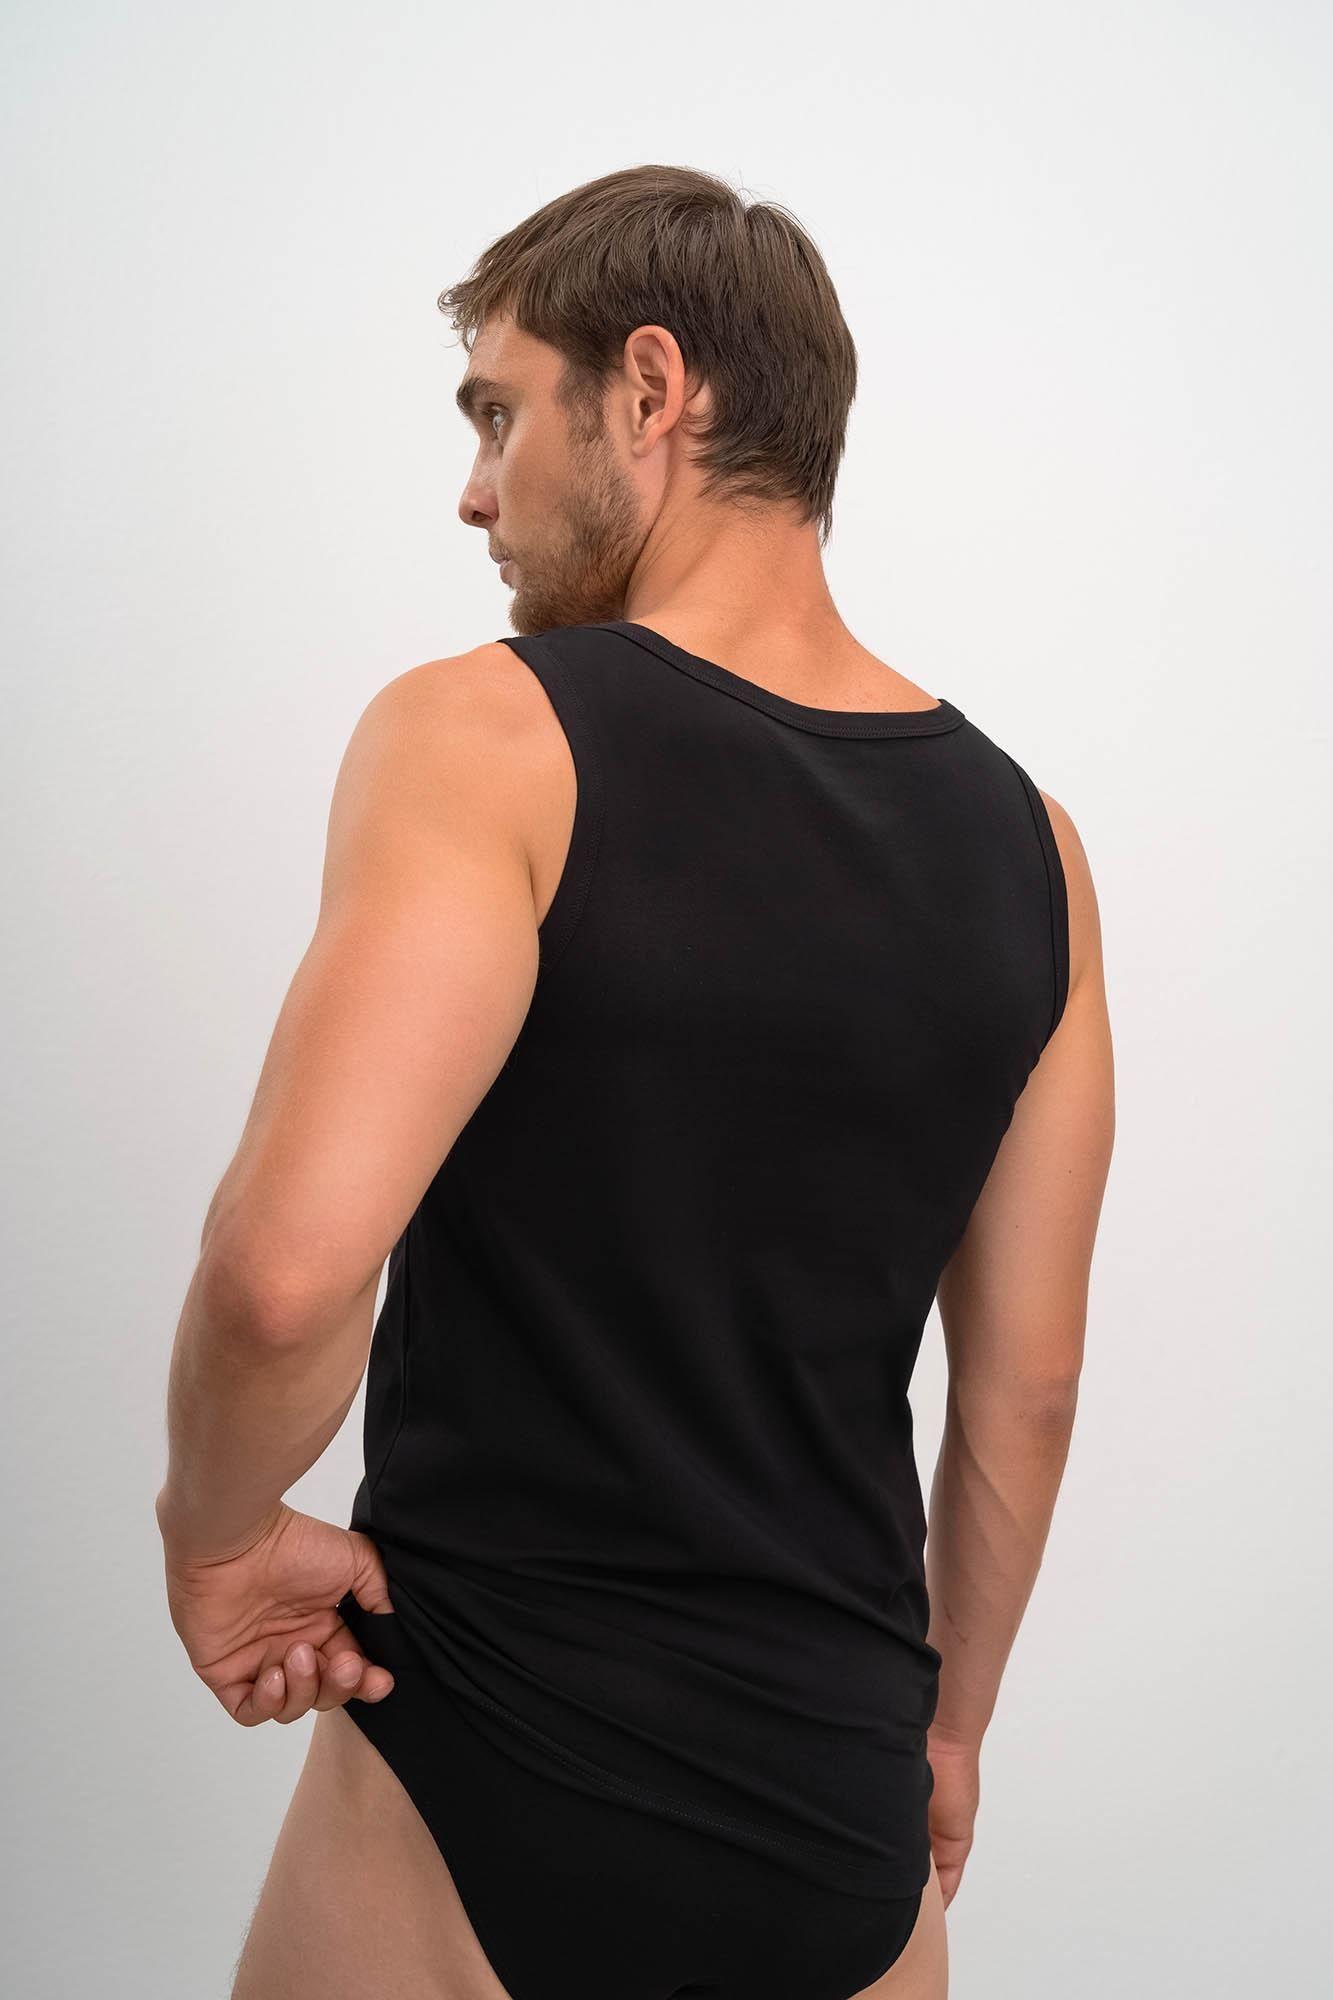 Men's 2 Pack Sleeveless Cotton Vests